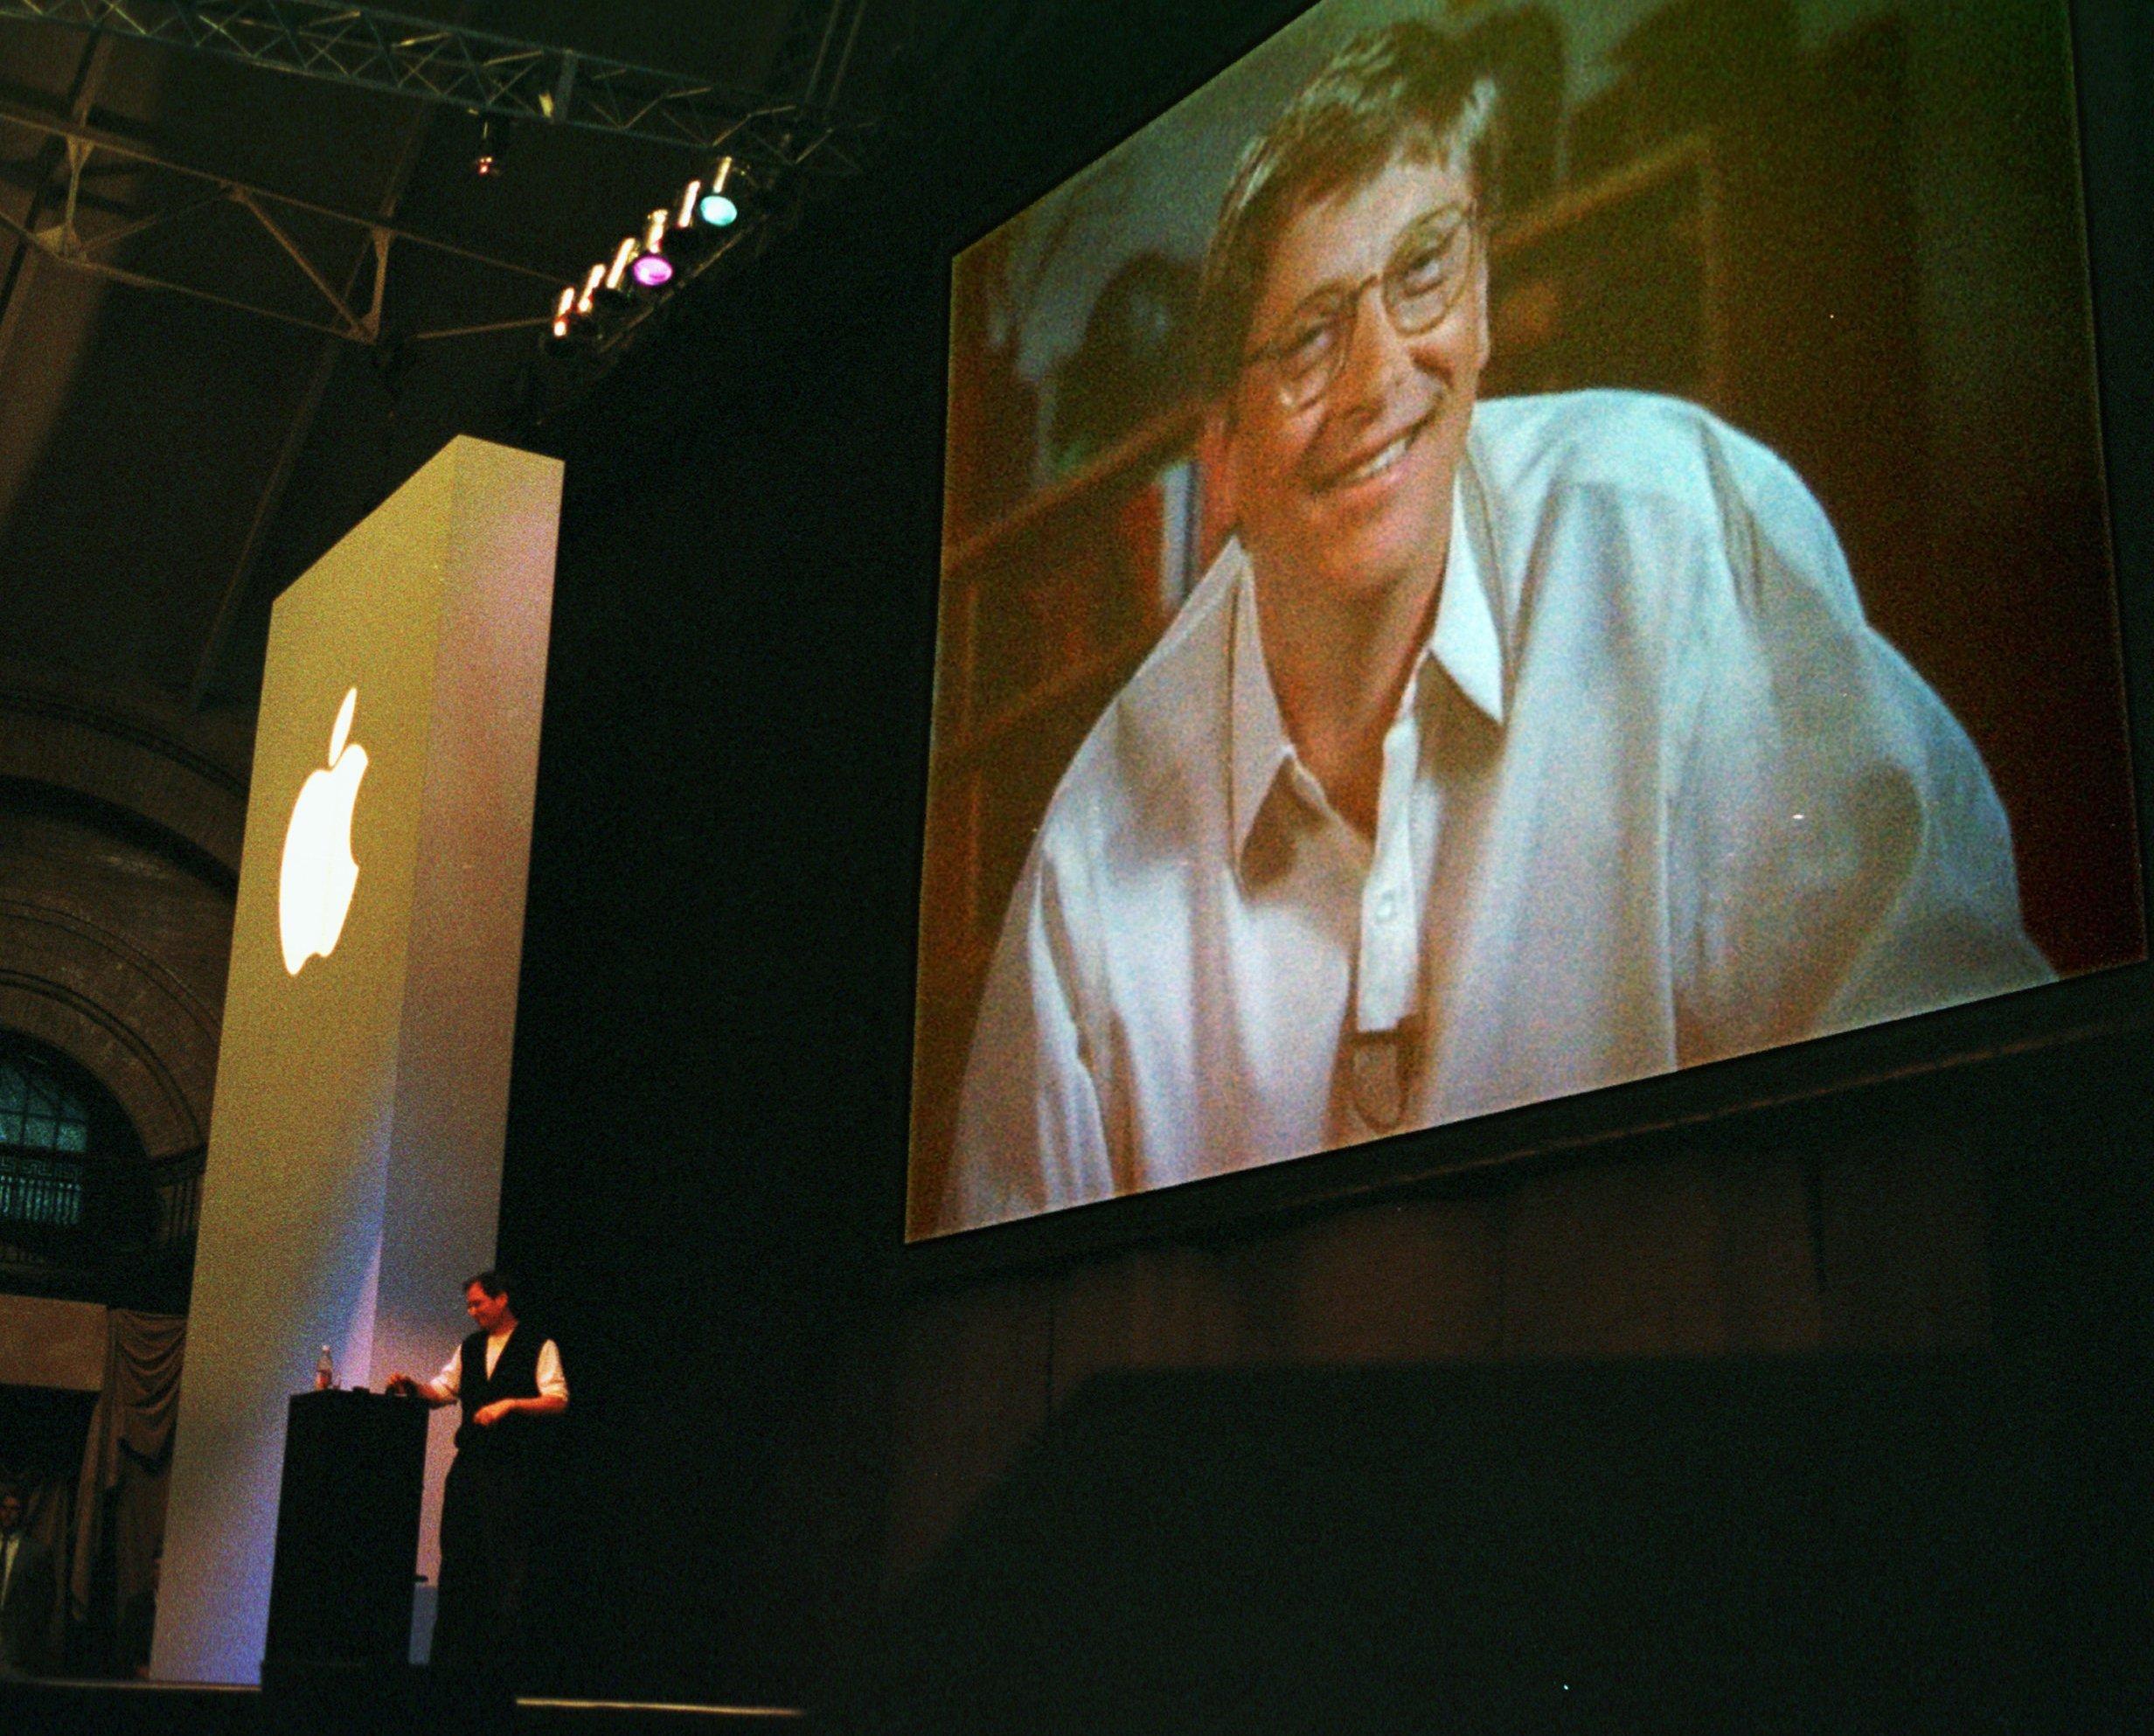 Bill Gates hovering over Jobs at MacWorld Boston 1997 .